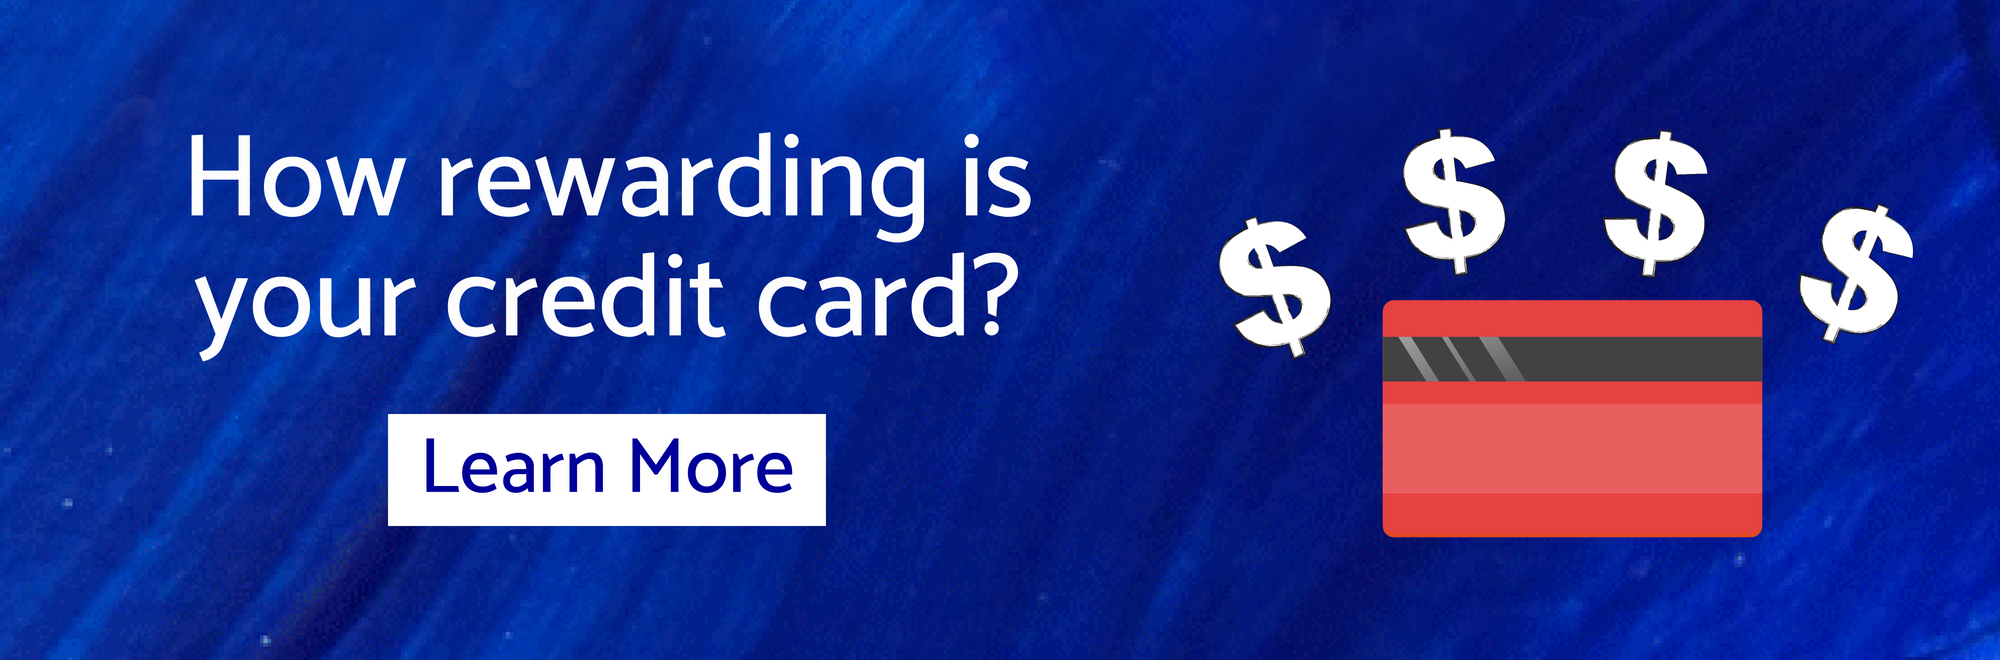 VISA Credit Cards - Learn More